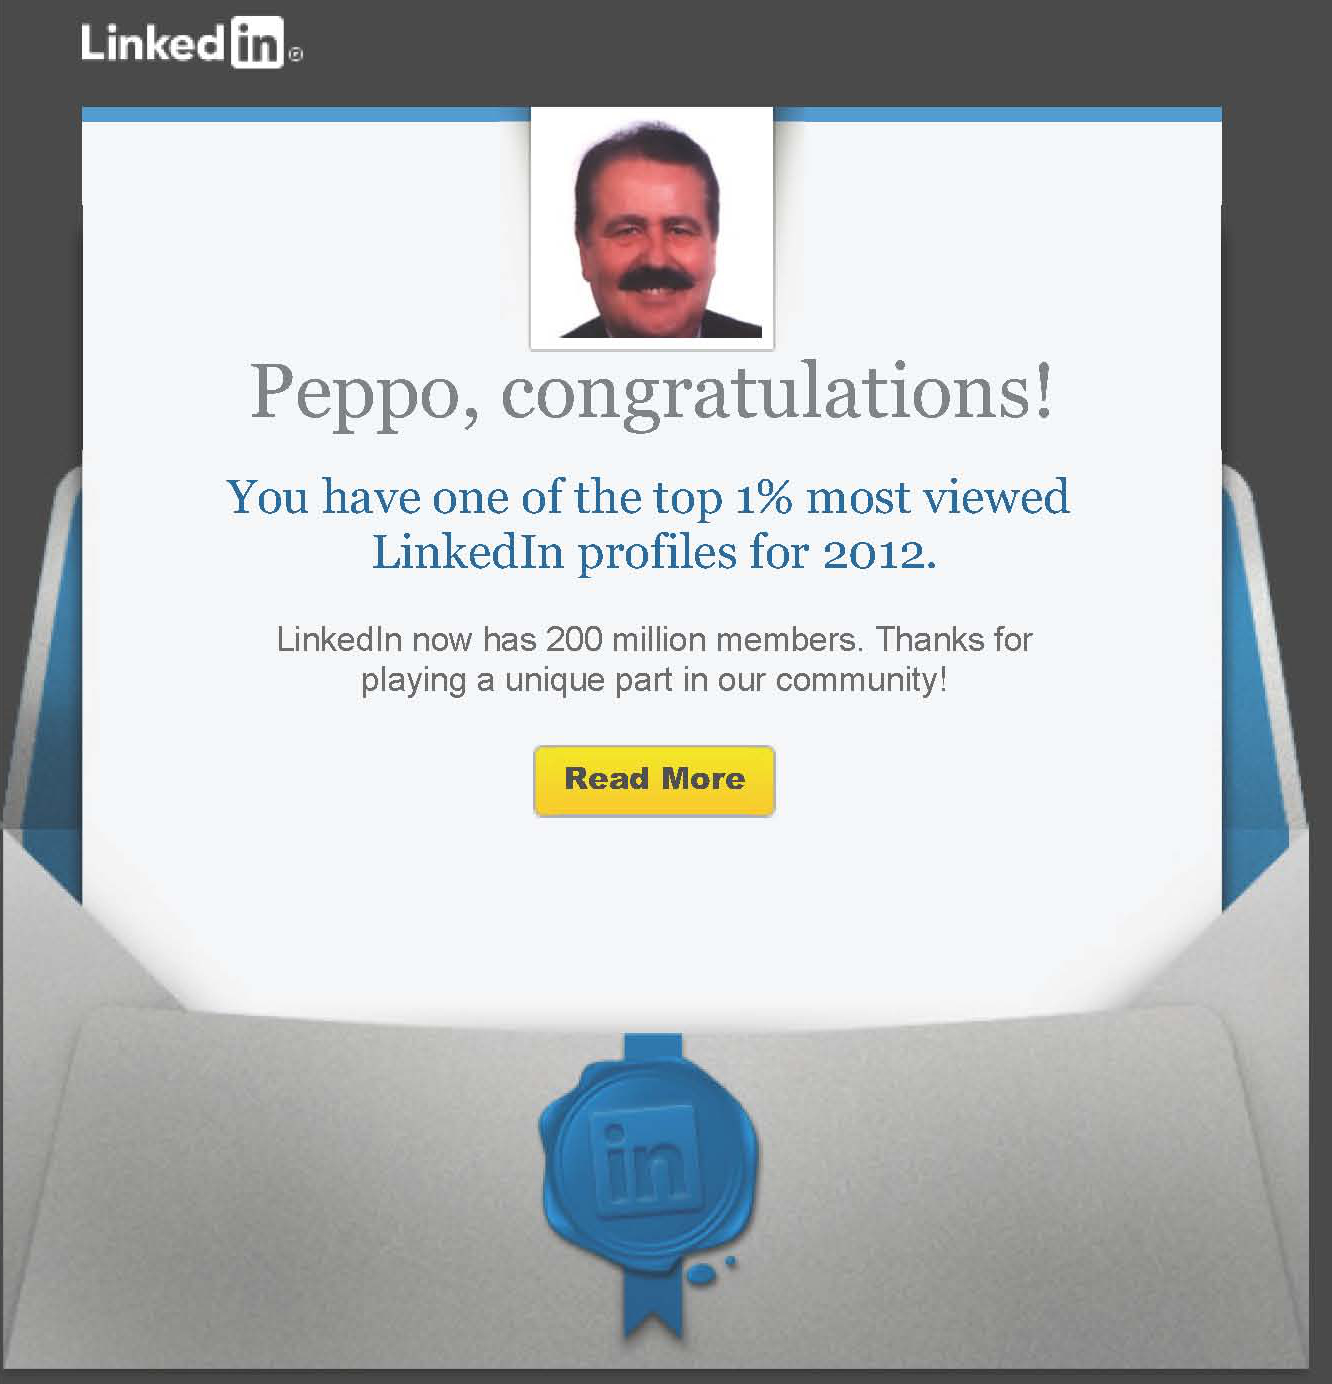 LinkedinTop1